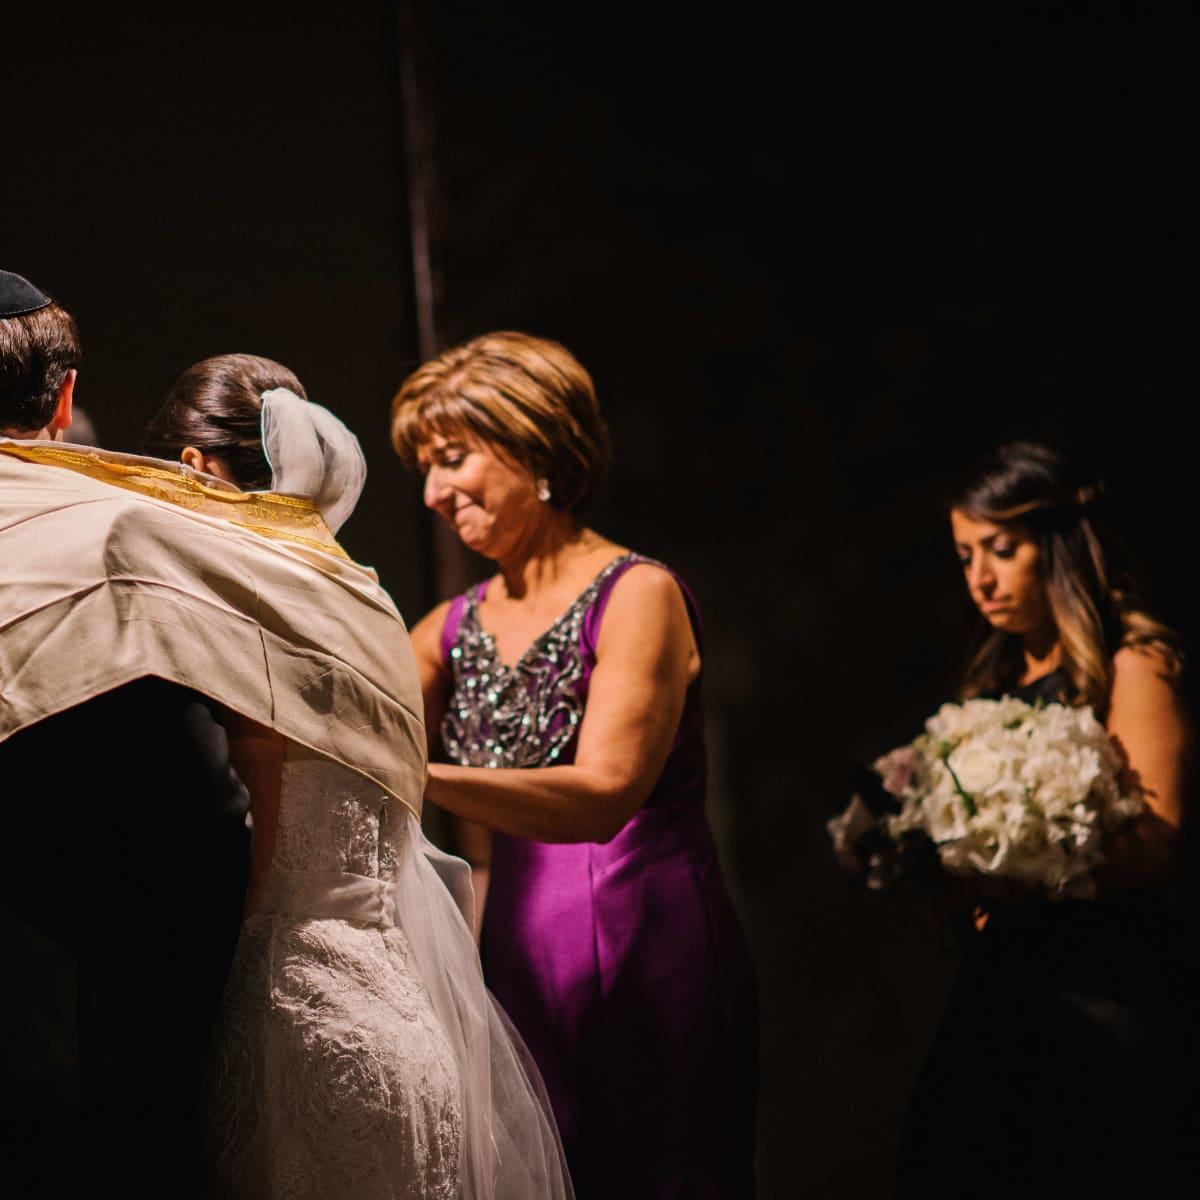 Silber Putterman Wedding